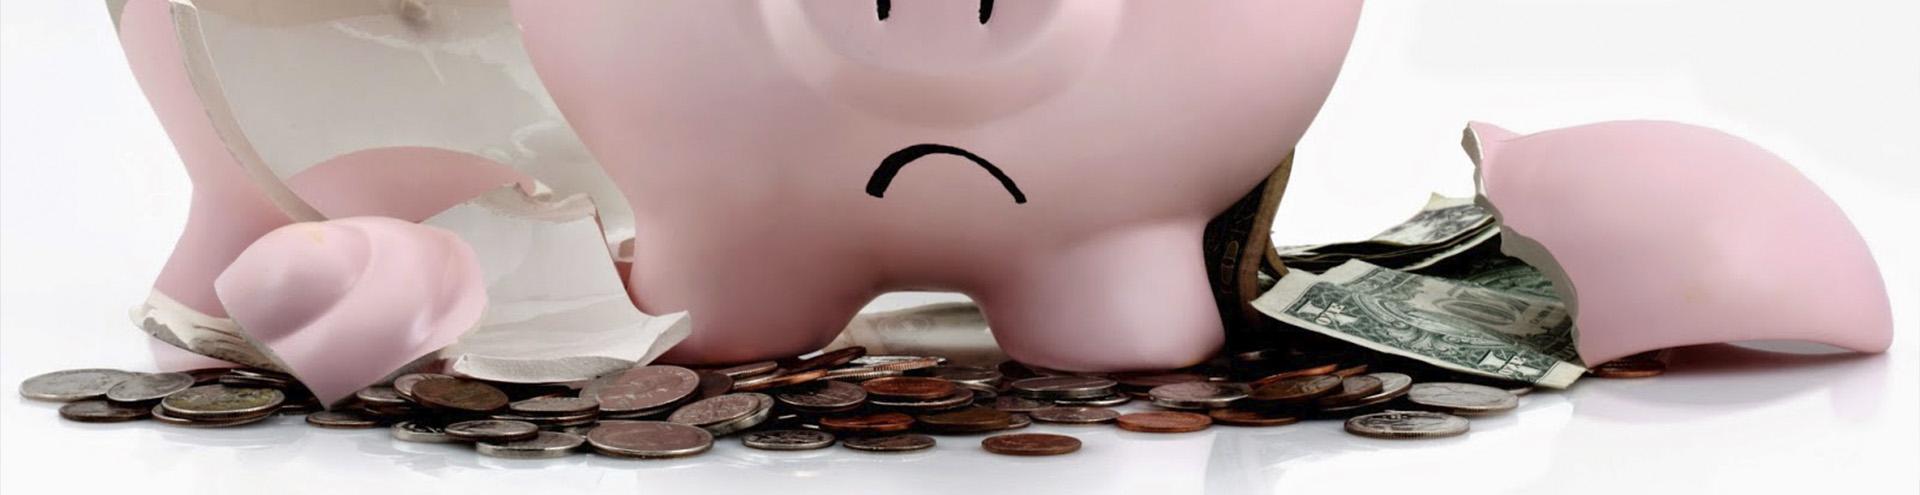 банкротство банка в Ижевске